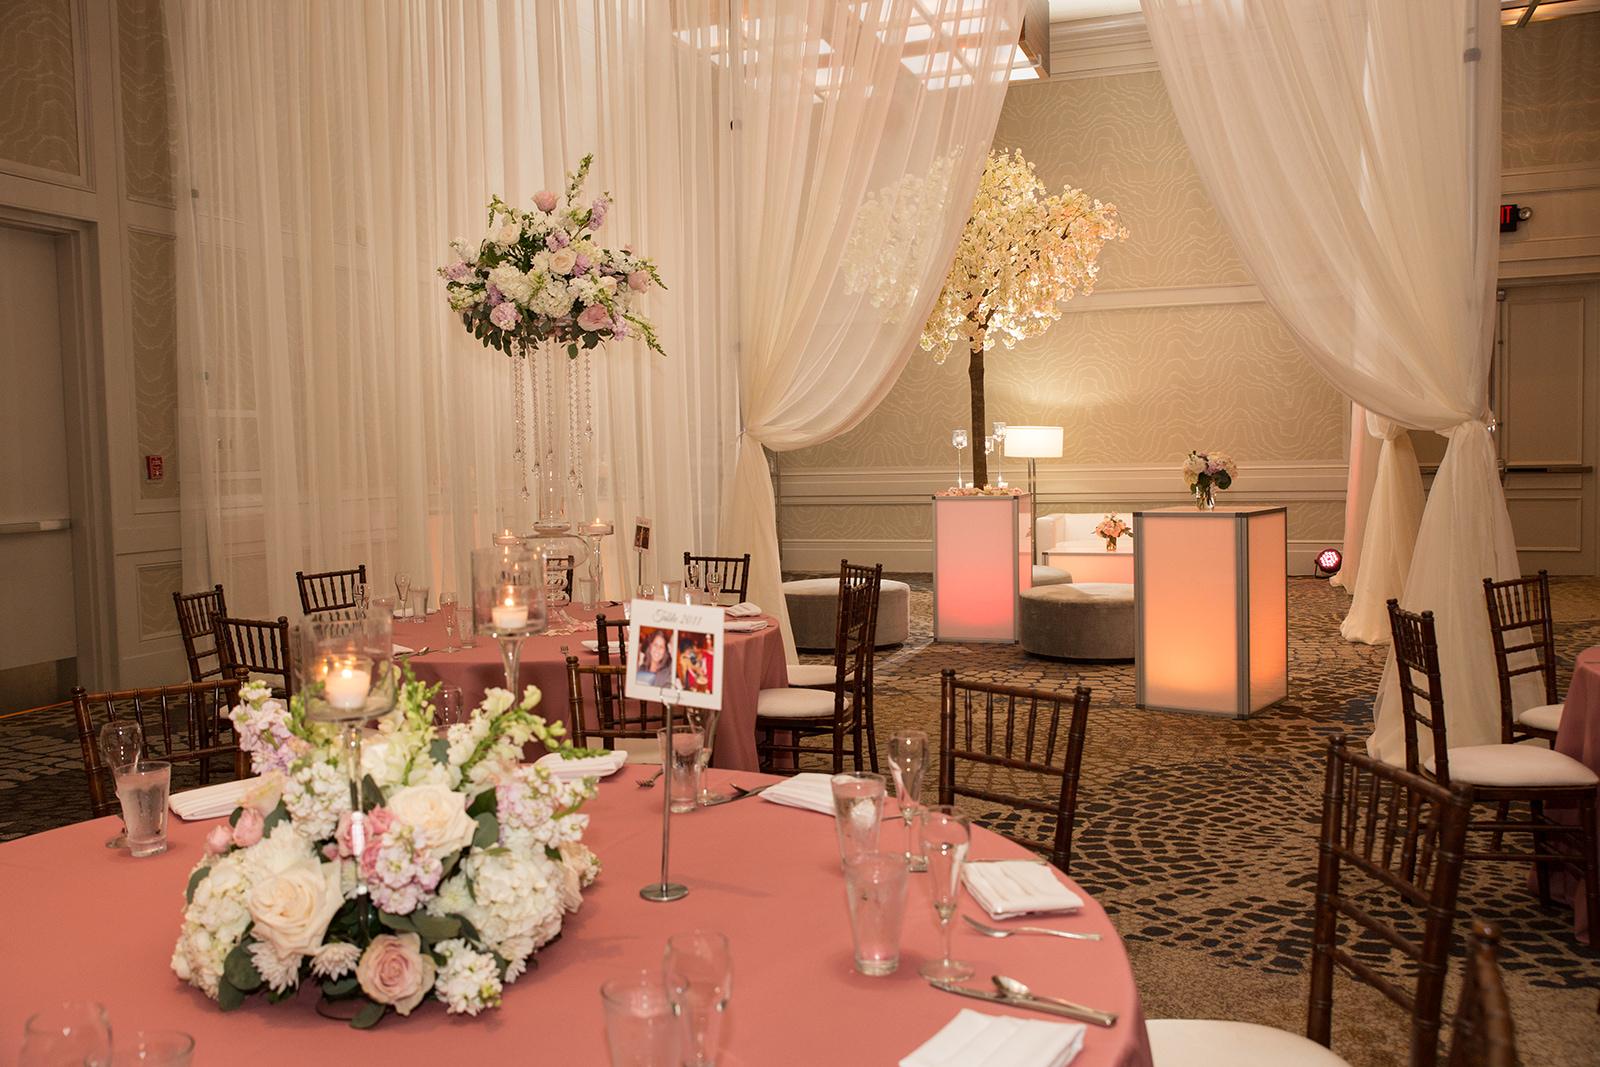 Le Cape Weddings - Sumeet and Chavi - Reception Details  -36.jpg